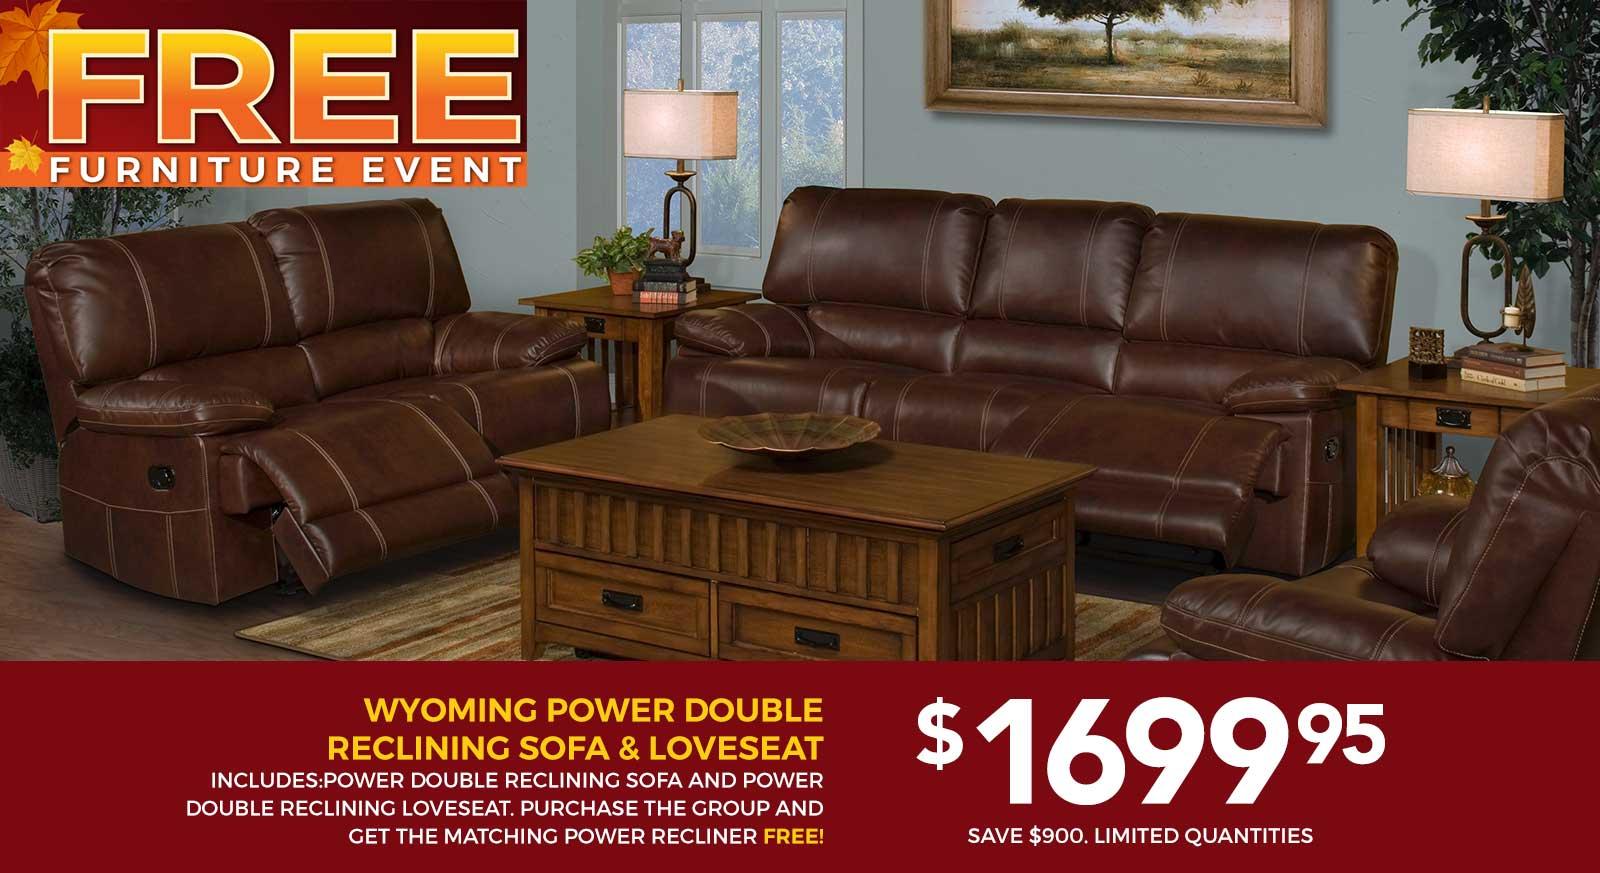 Furniture Appliances Electronics Mattresses In Longview